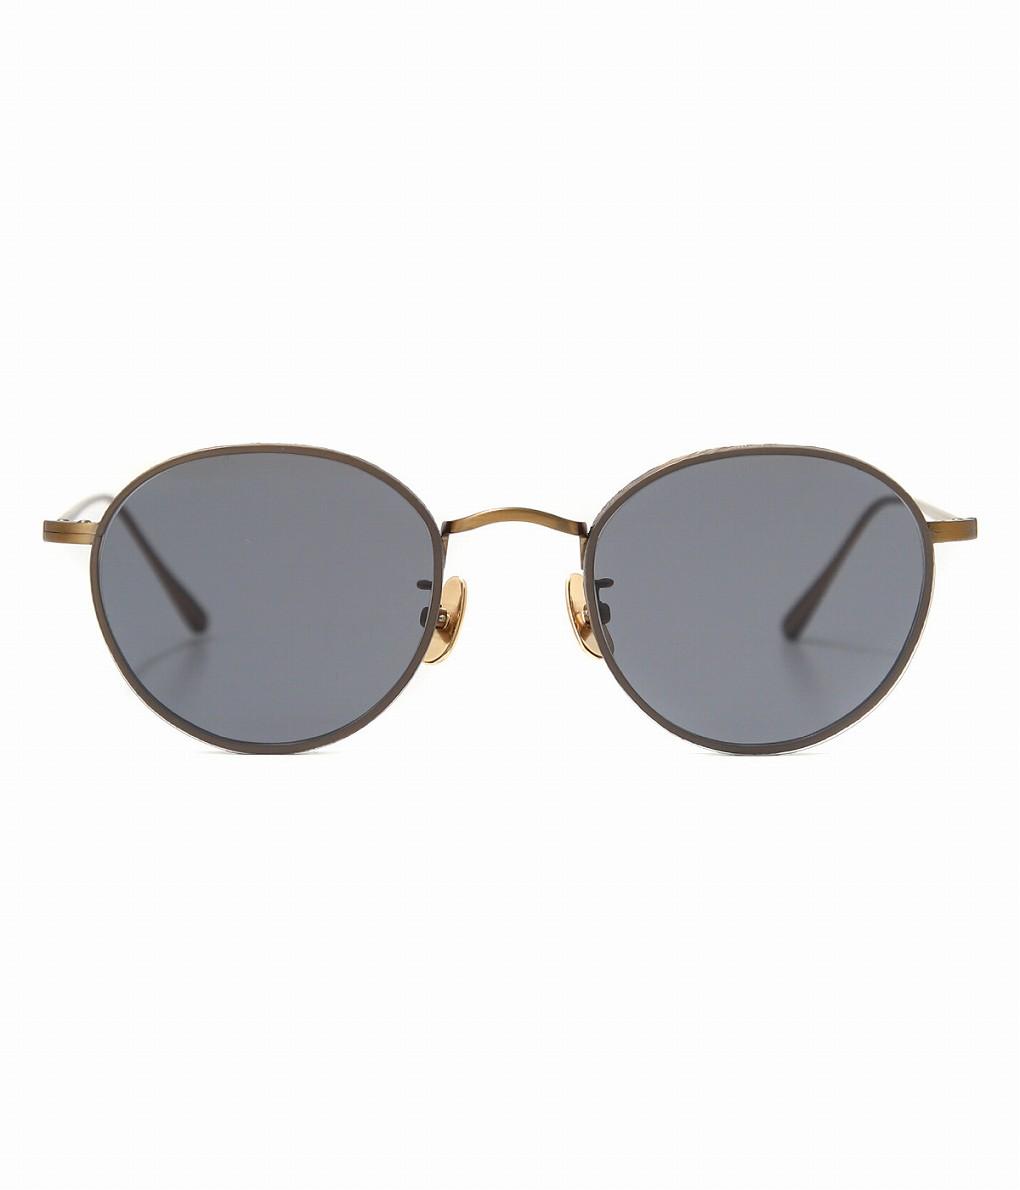 A.D.S.R. / エーディーエスアール : BUKEM01 -Antique Gold- : ADSR ゴールド ブラック サングラス メンズ : BUKEM01-a【WAX】